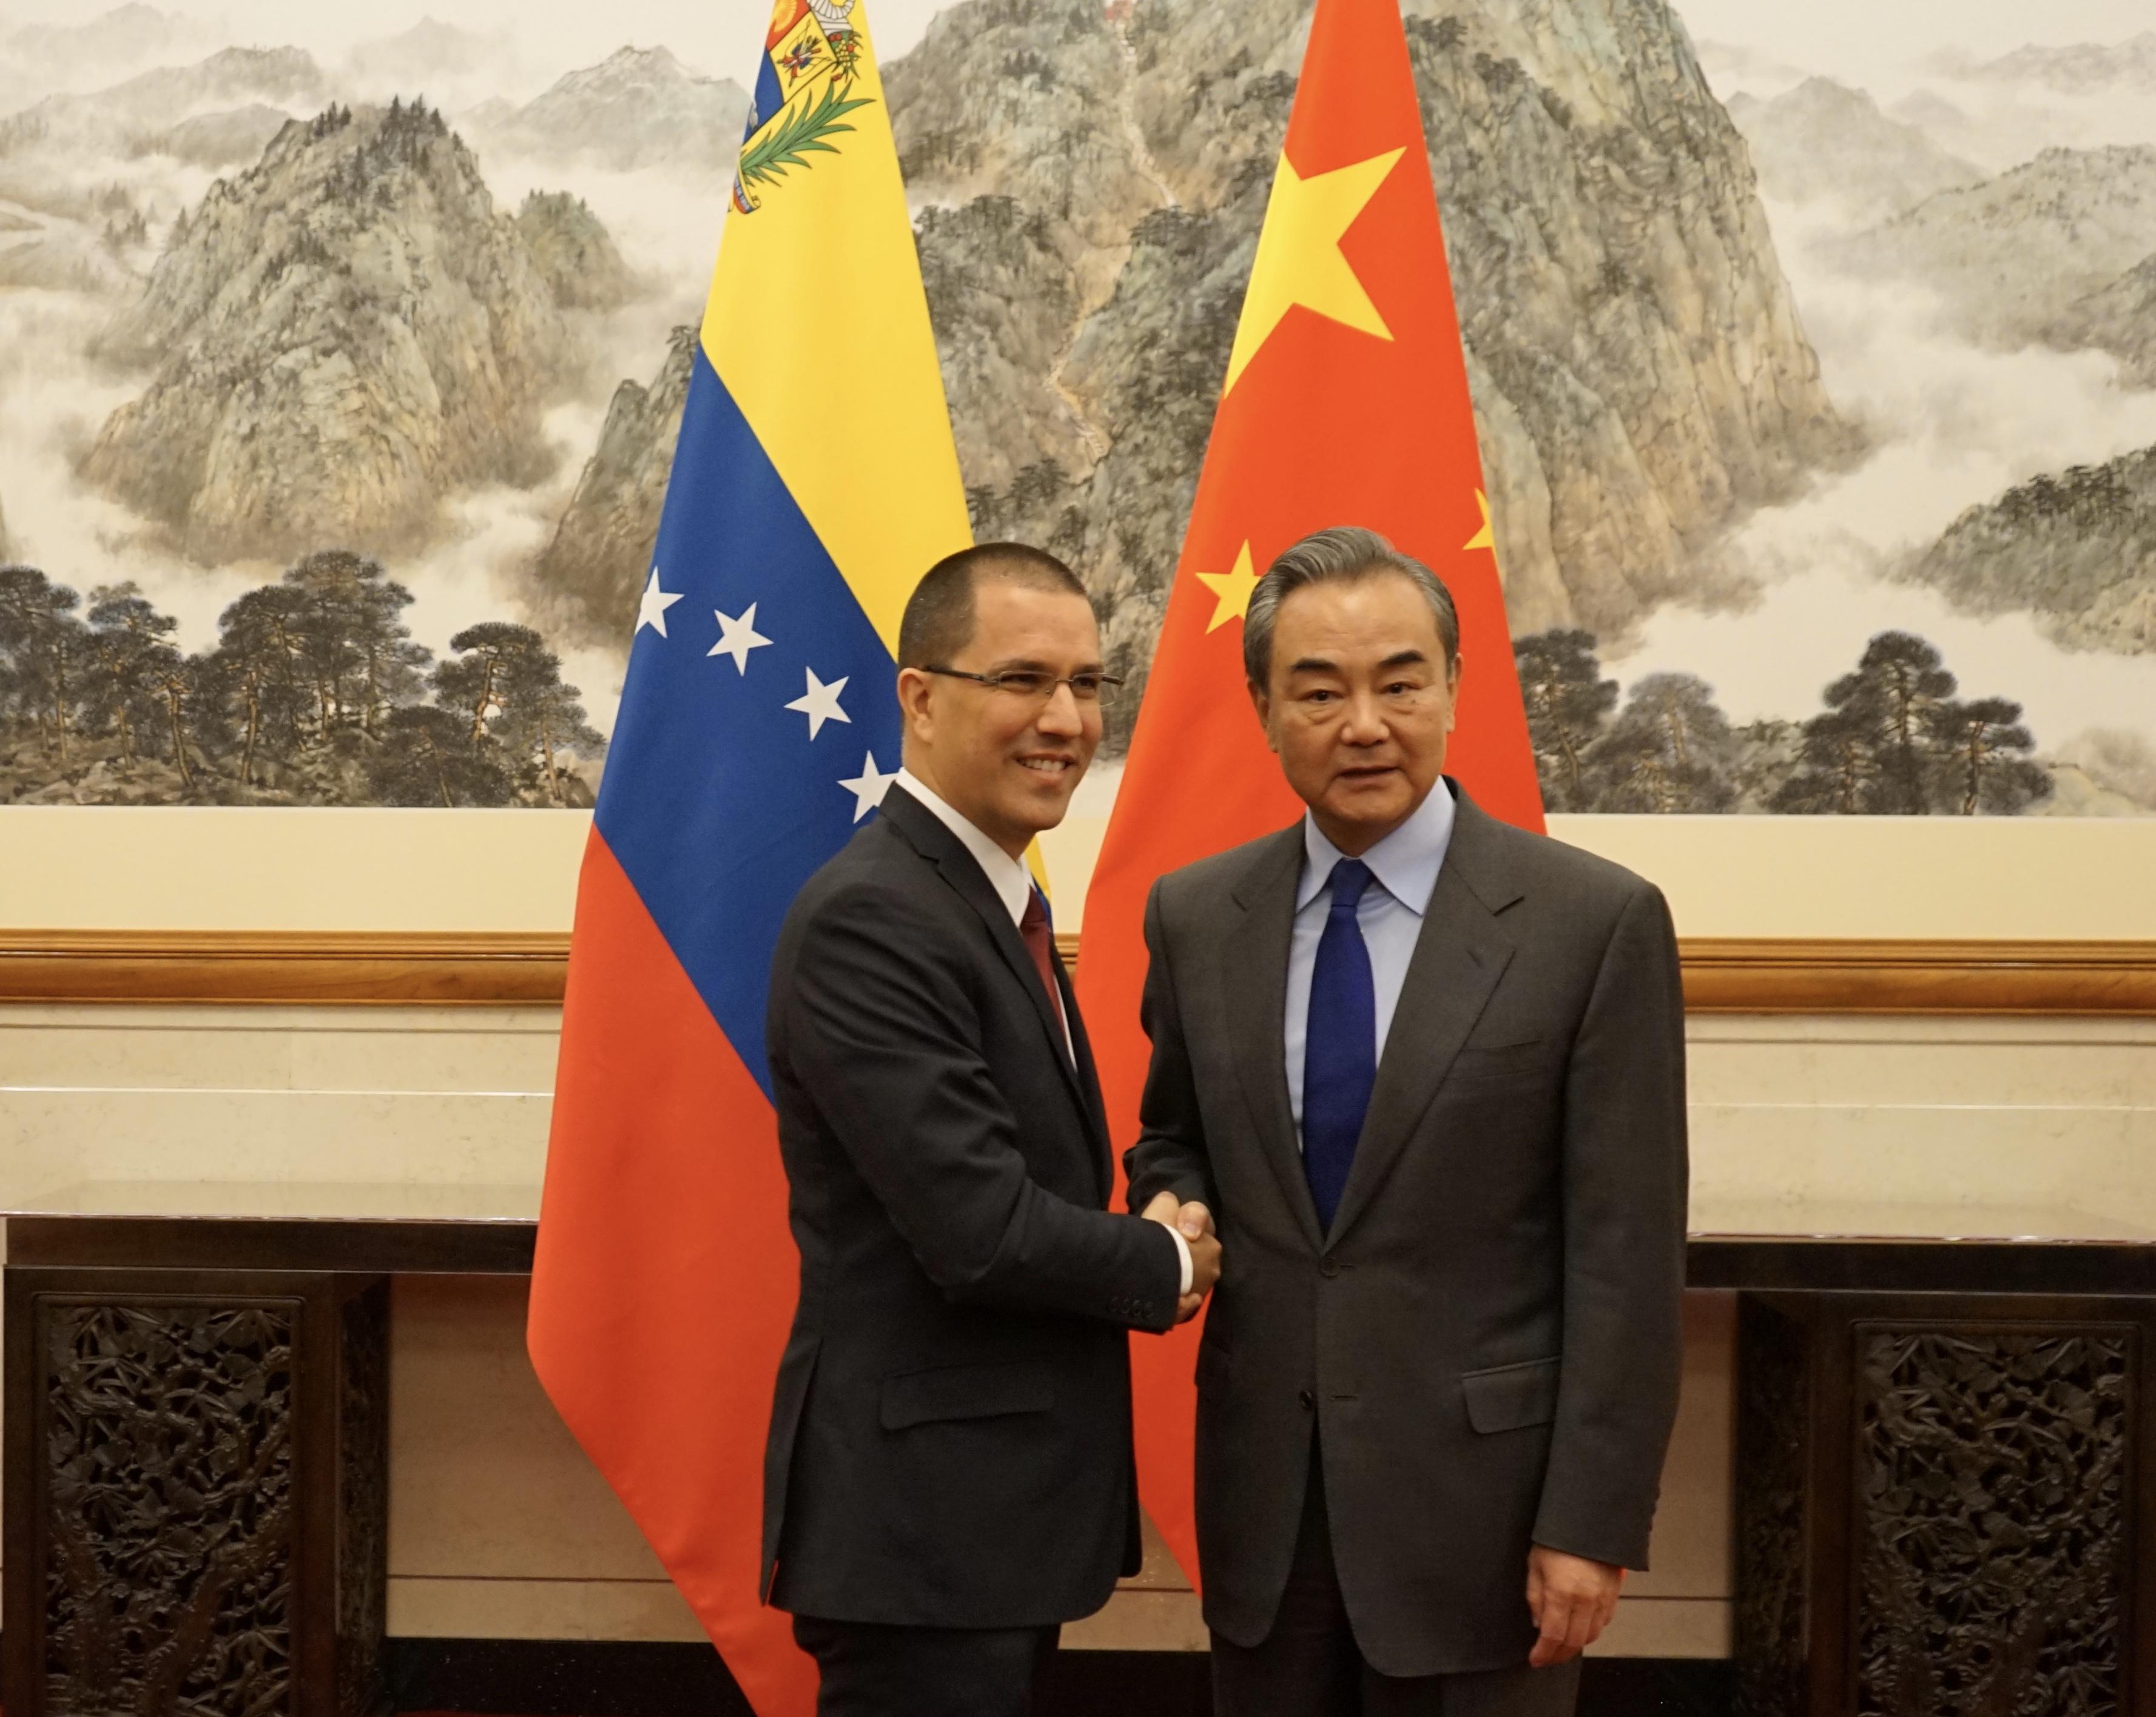 Canciller Arreaza se reúne en Beijing con su homólogo chino Wang Yi